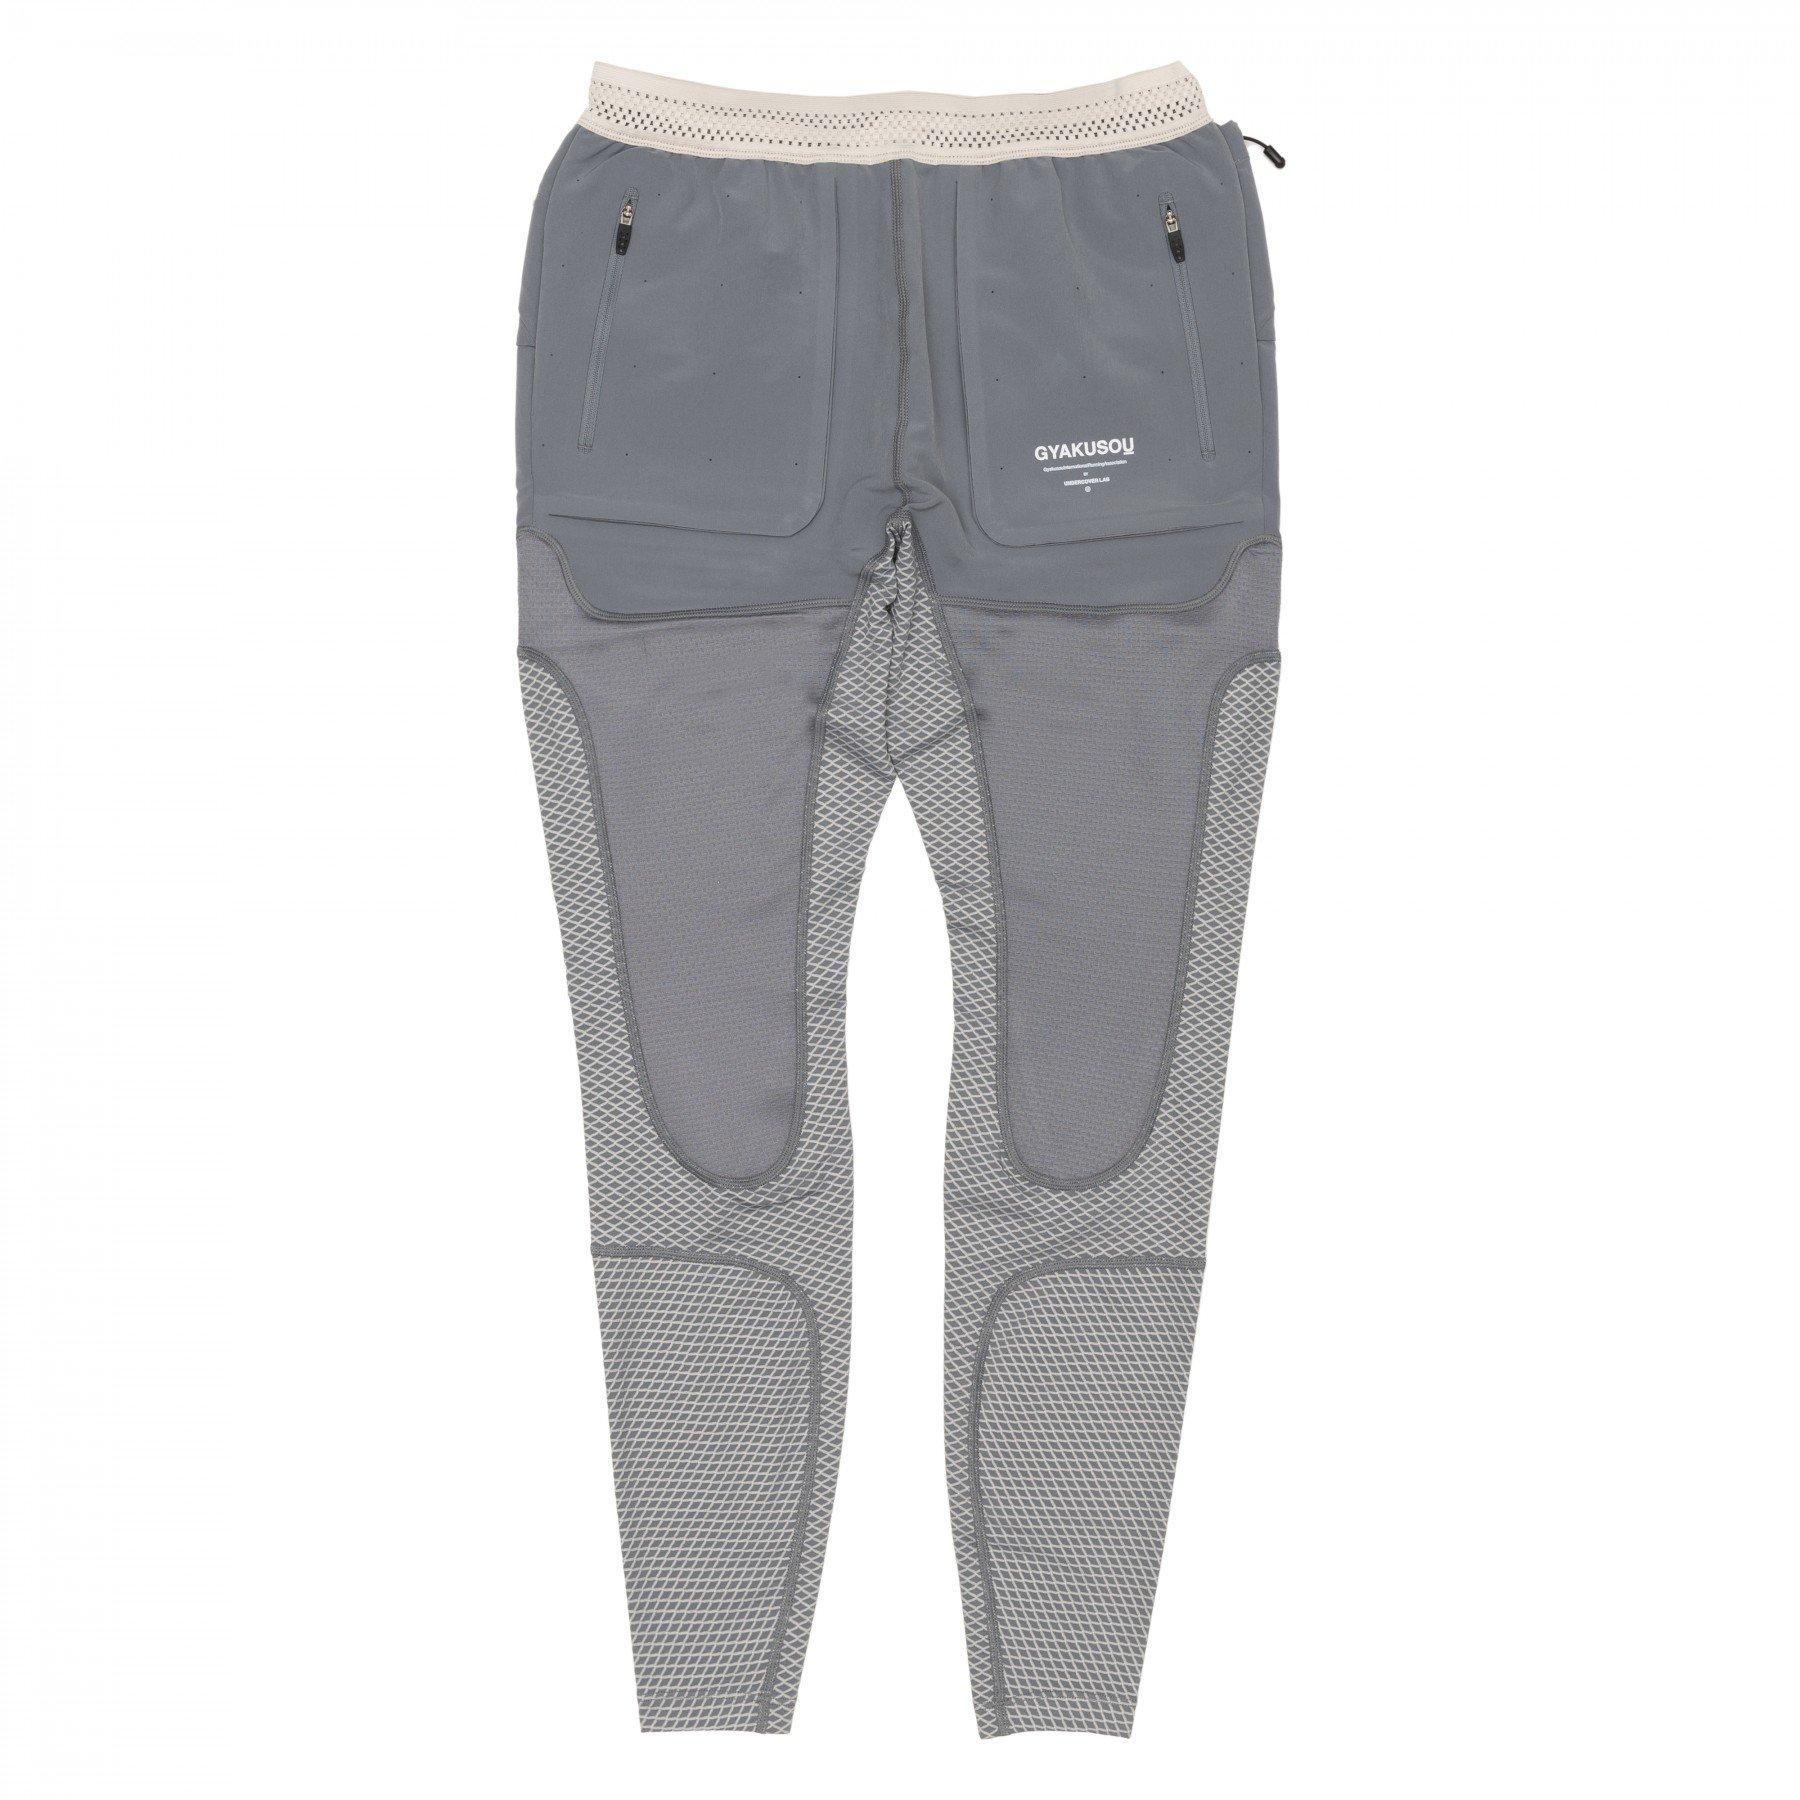 NIKE Men's NikeLab Gyakusou Utility Tight - Cool Grey Size Small